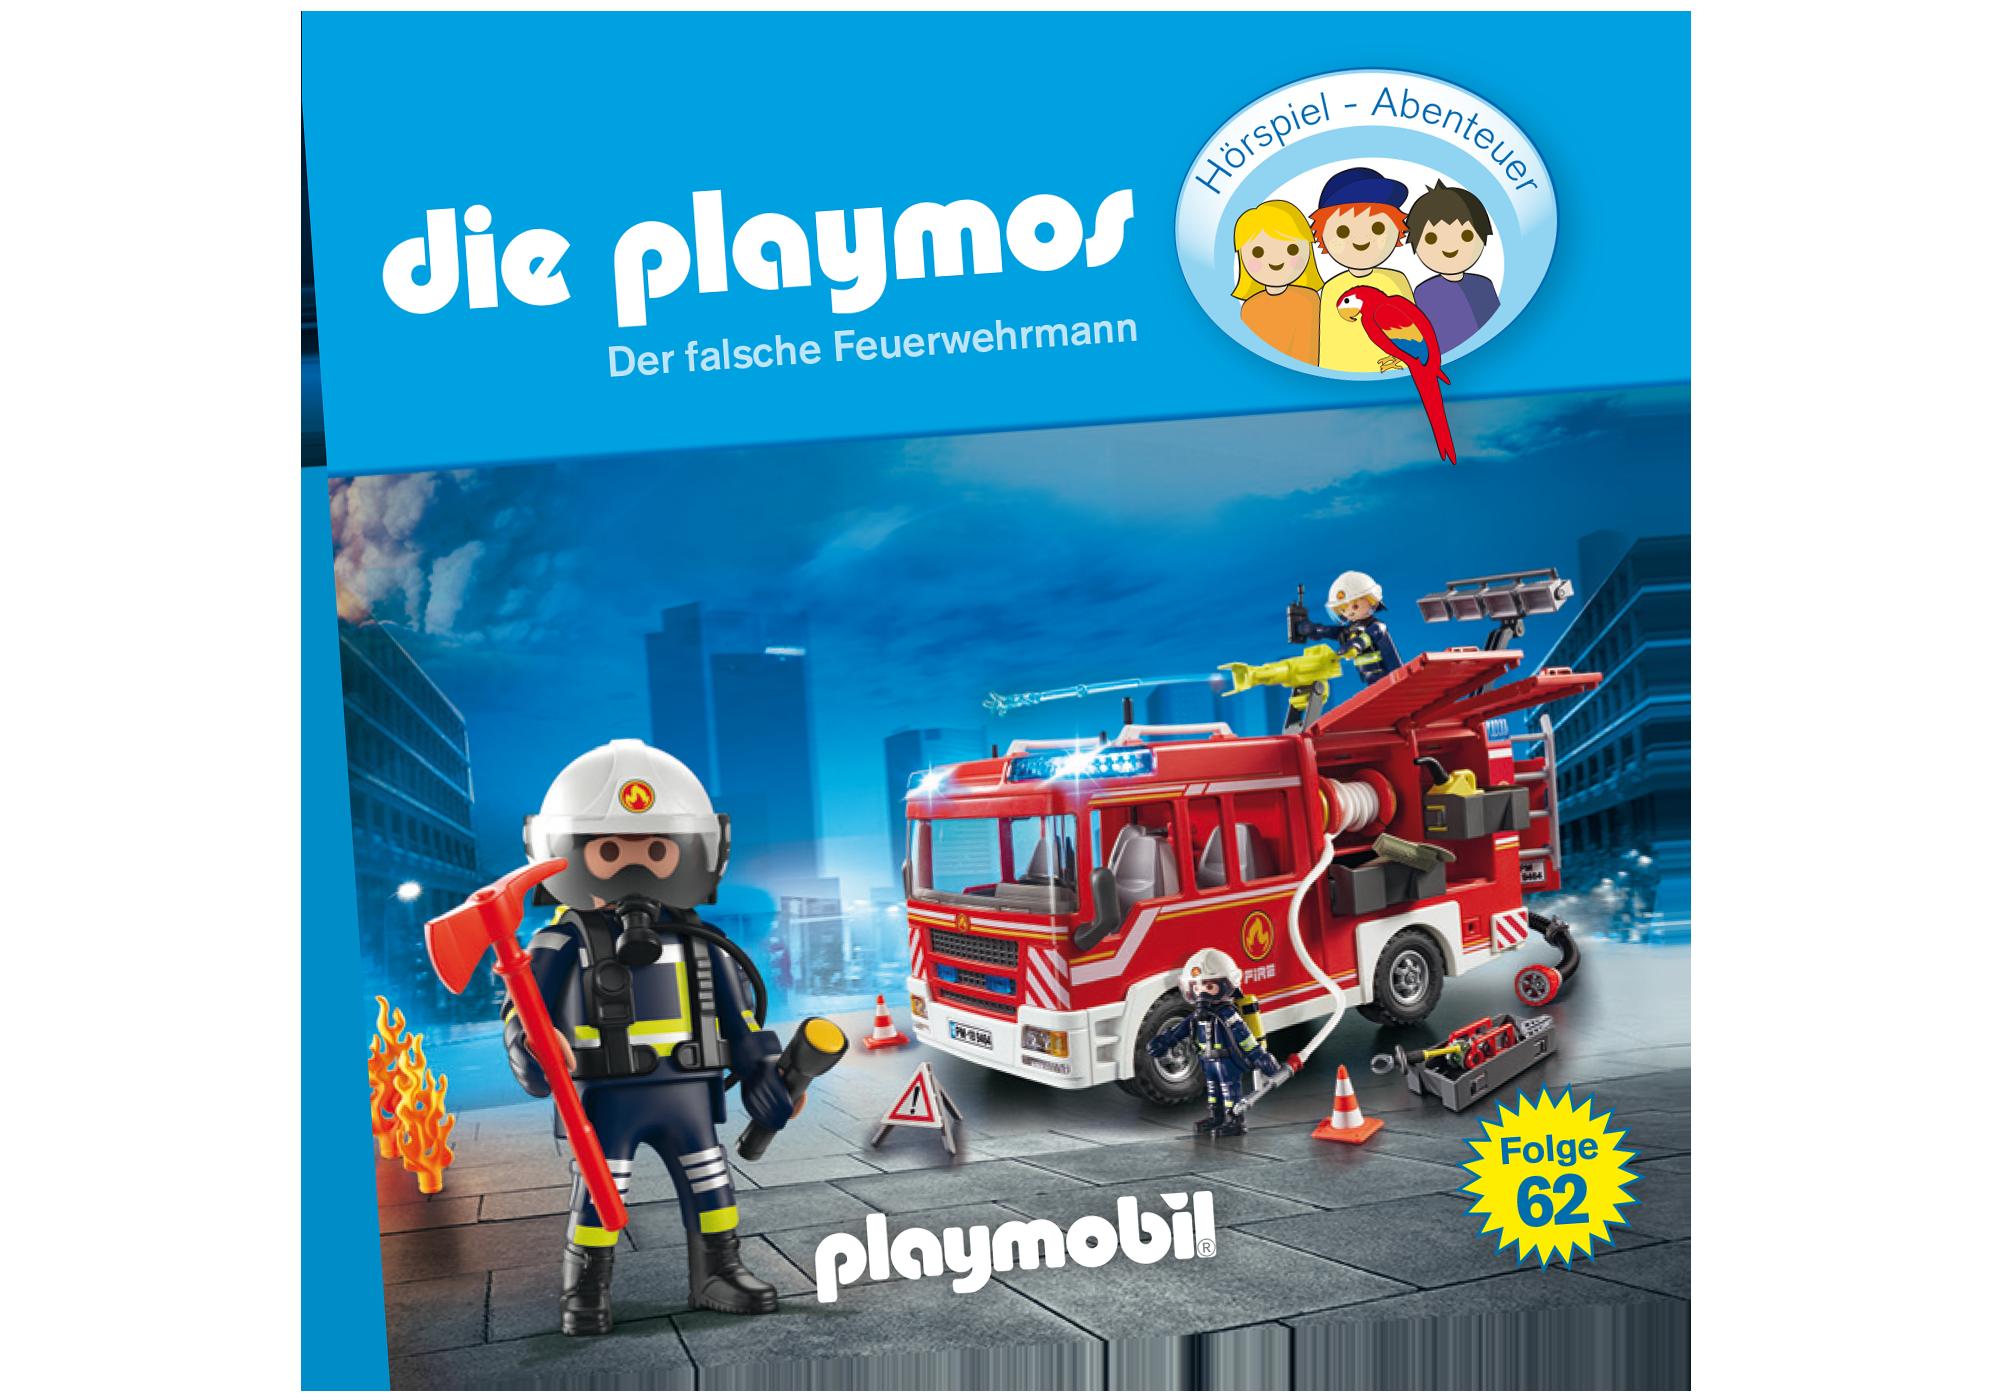 http://media.playmobil.com/i/playmobil/80084_product_detail